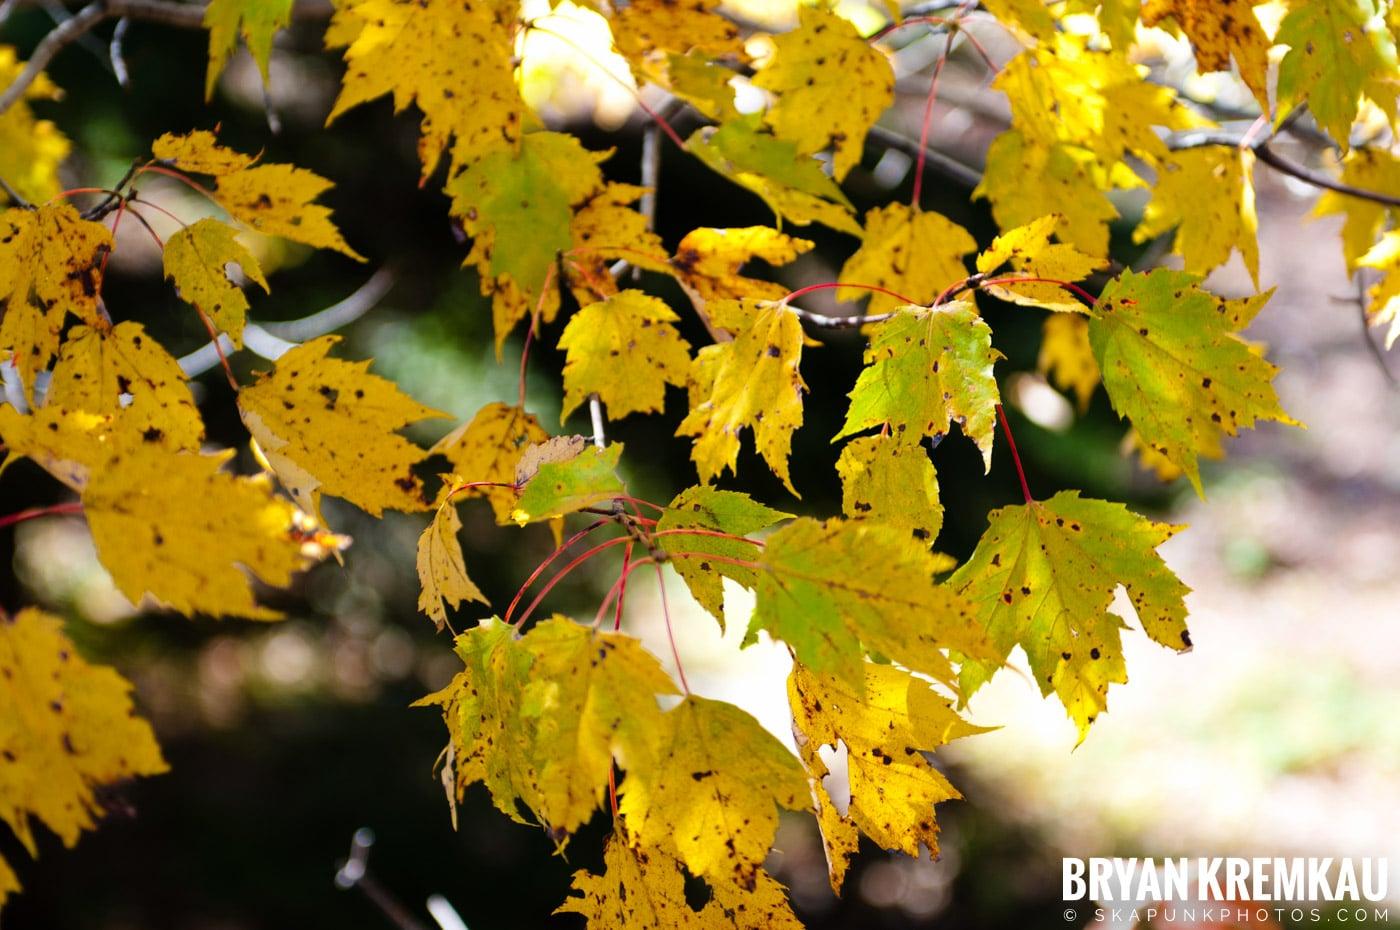 Minnewaska State Park Preserve @ Wawarsing, New York - 10.22.11 (12)